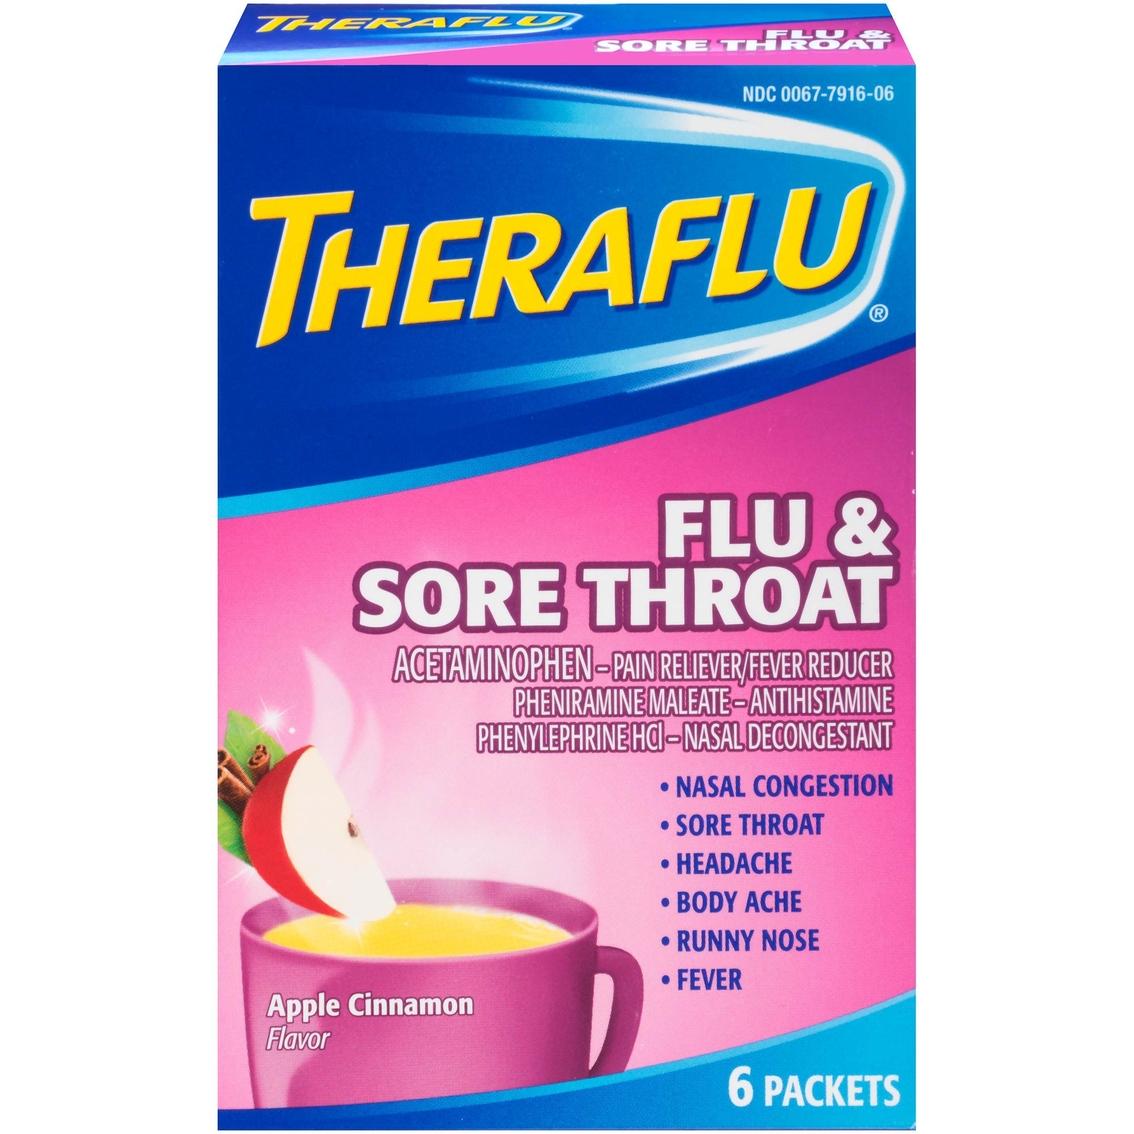 How does theraflu work